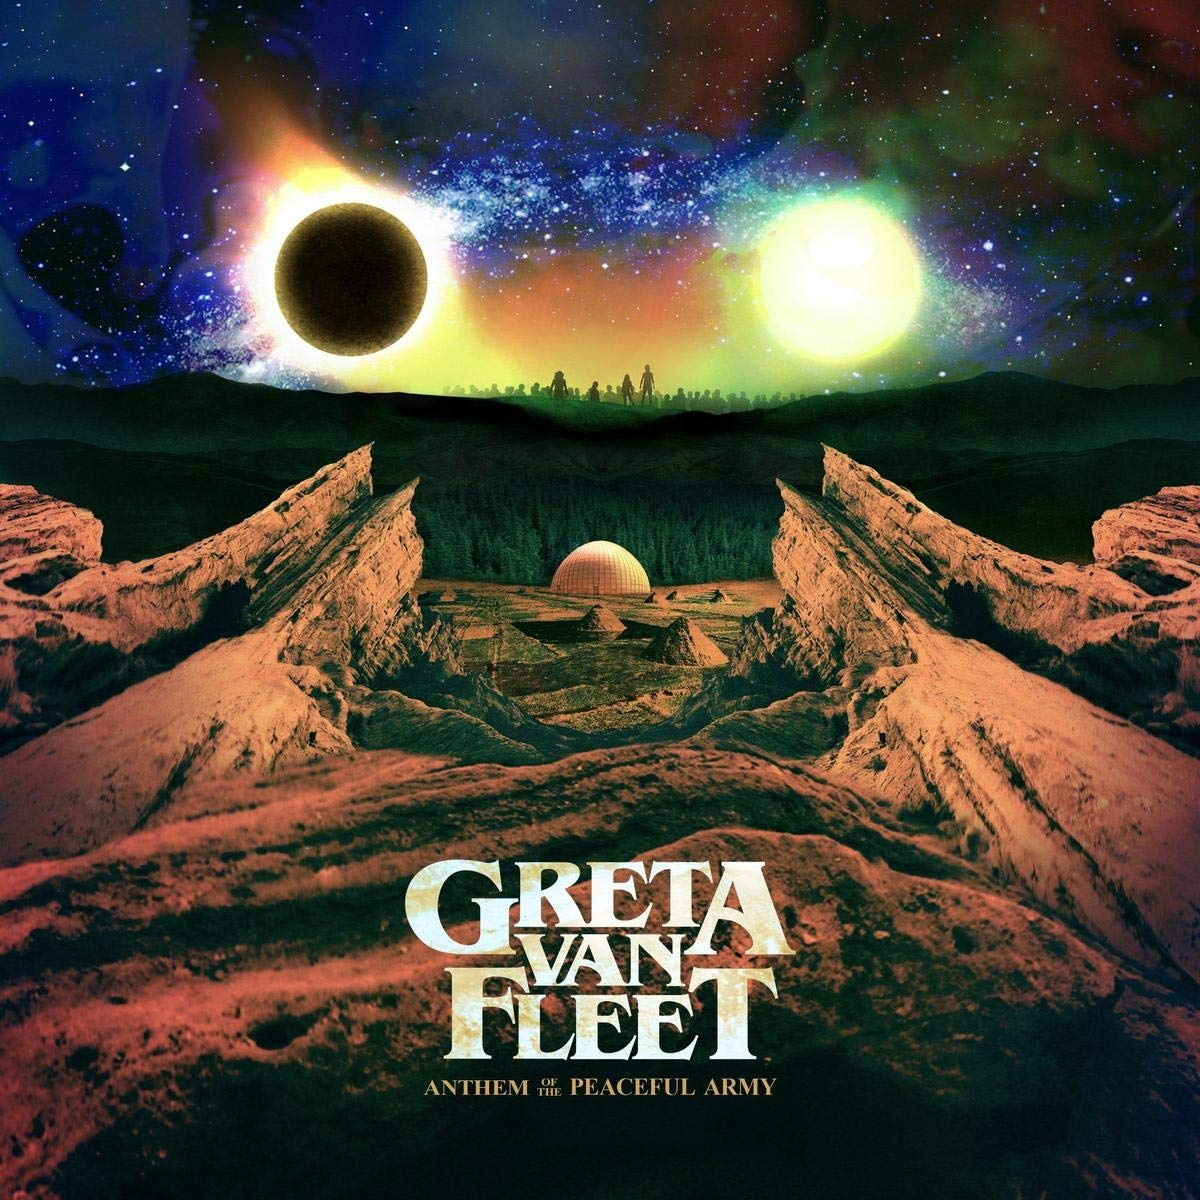 Greta Van Fleet - Anthem Of The Peaceful Army (2018) (Import, EU